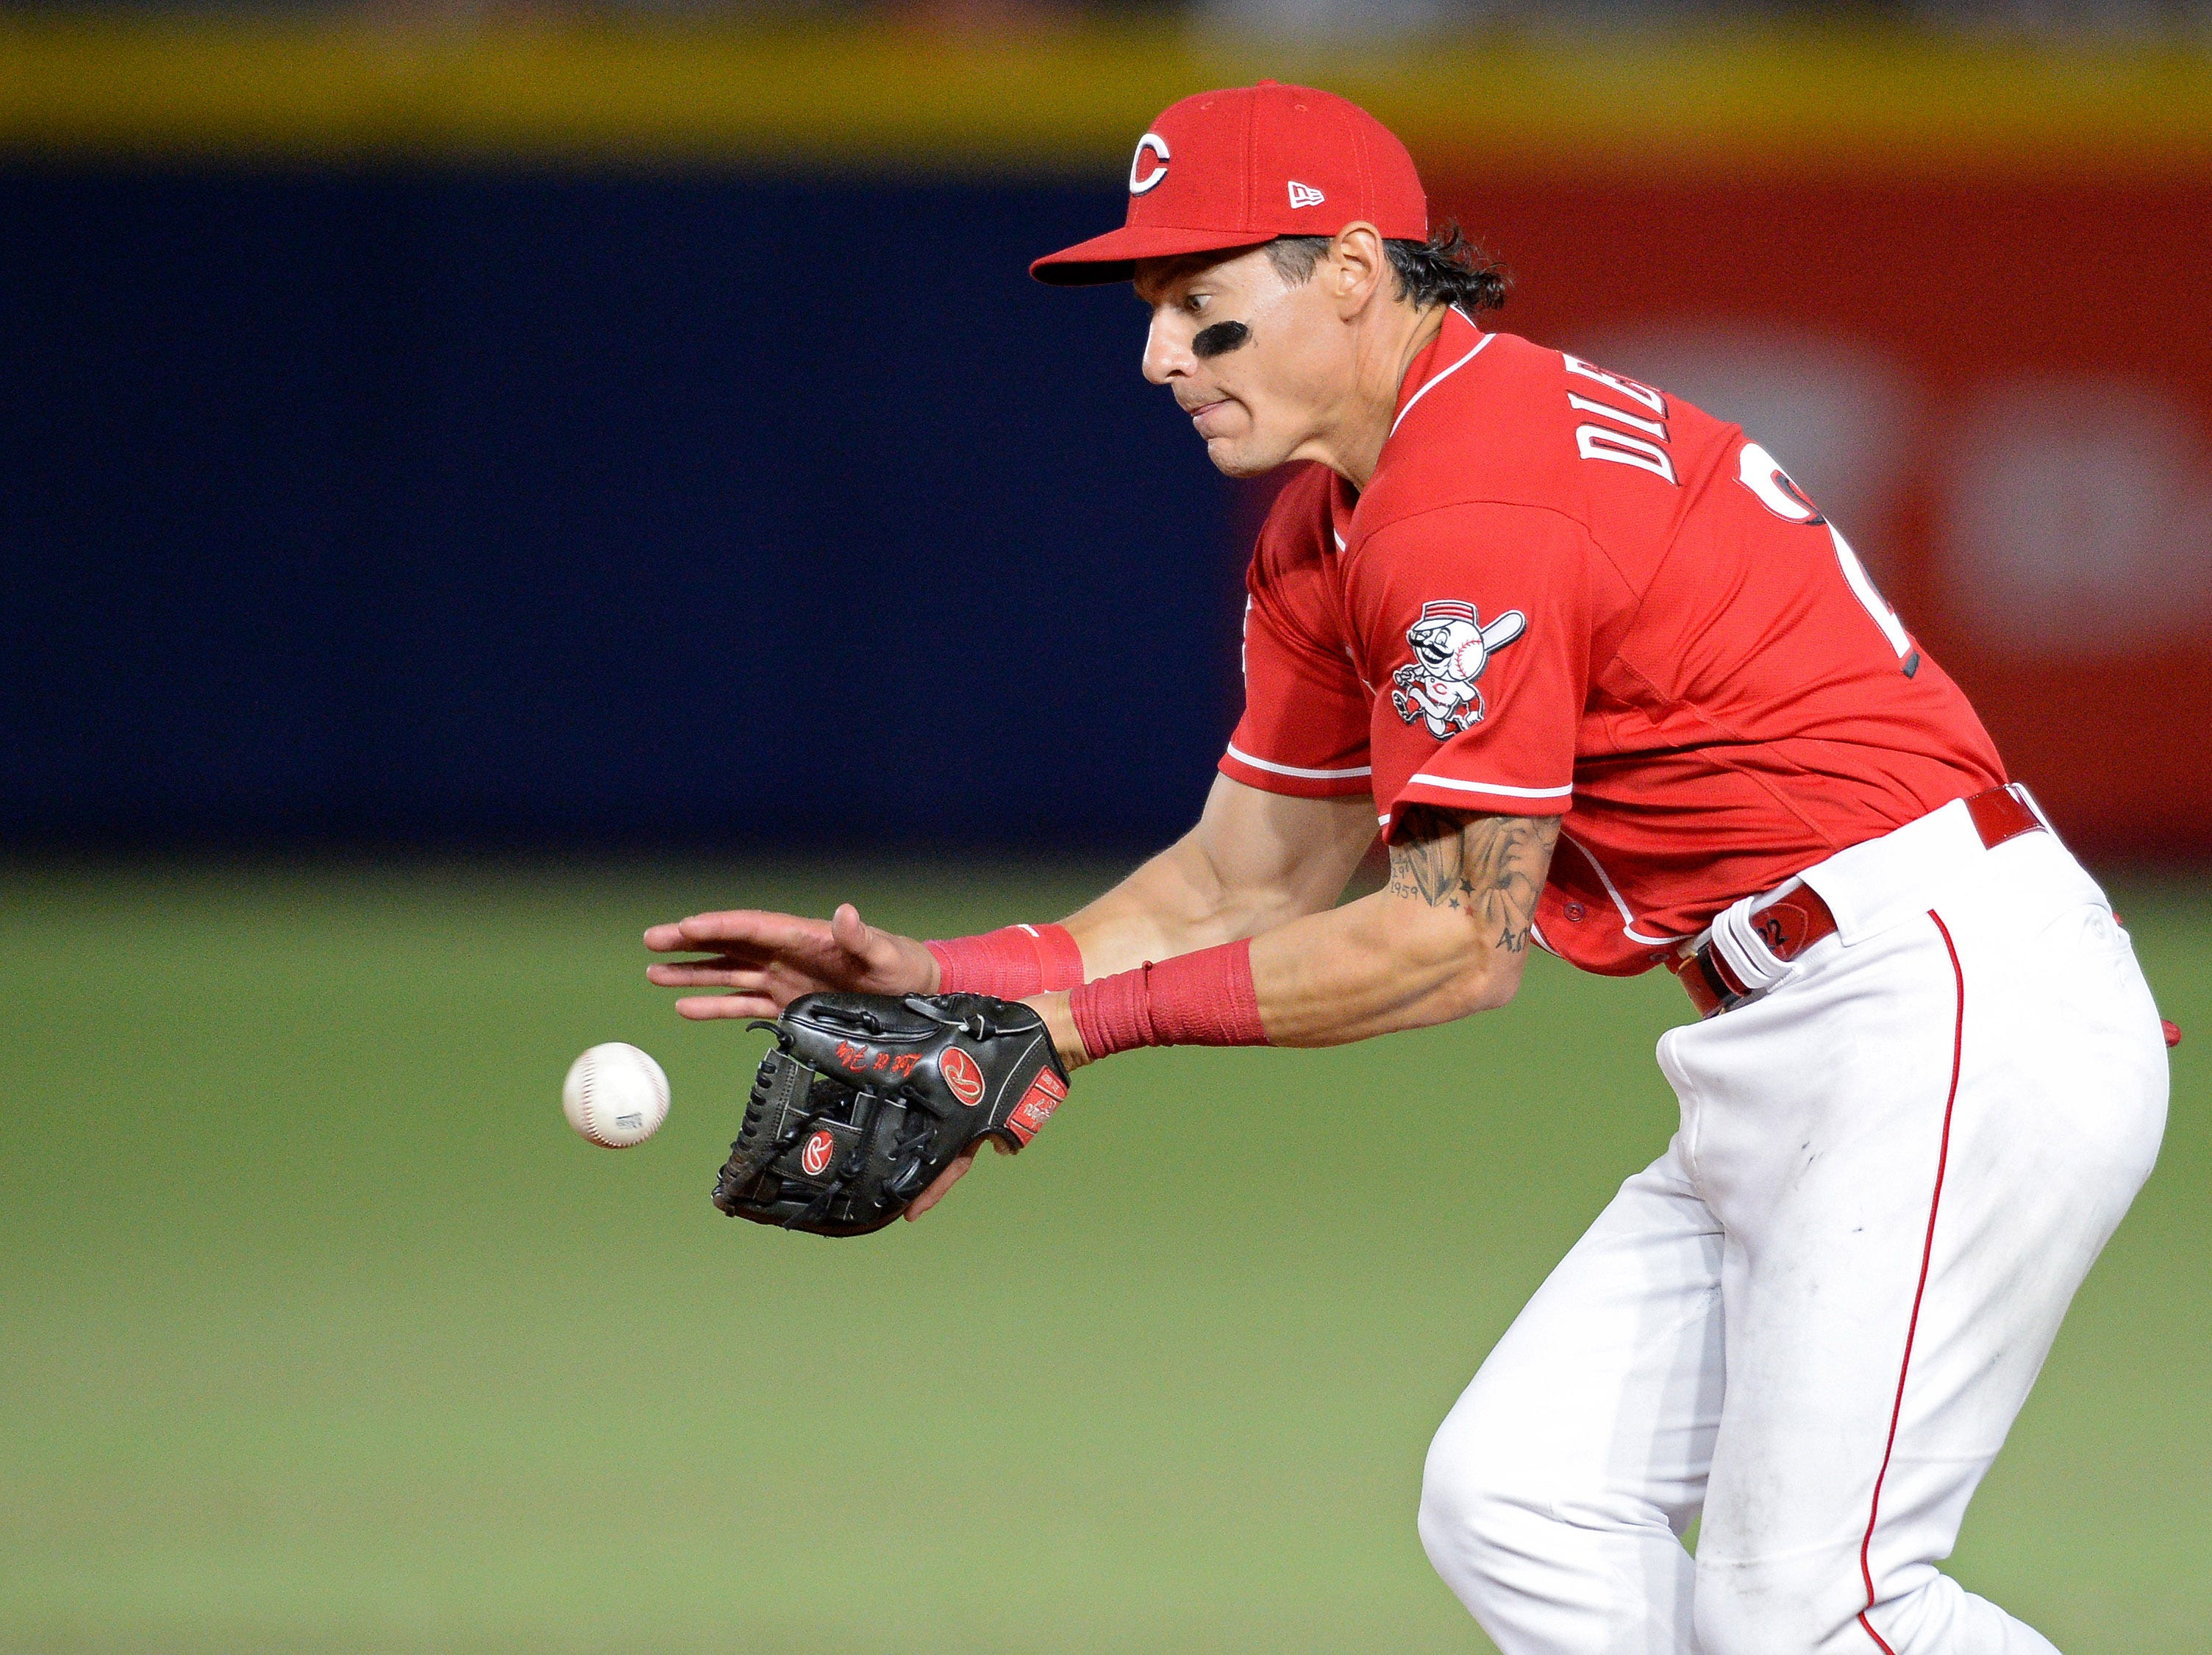 Cincinnati Reds second baseman Derek Dietrich (22) fields deflected ball hit by St. Louis Cardinals catcher Yadier Molina (not pictured) during the eighth inning at Estadio de Beisbol Monterrey.